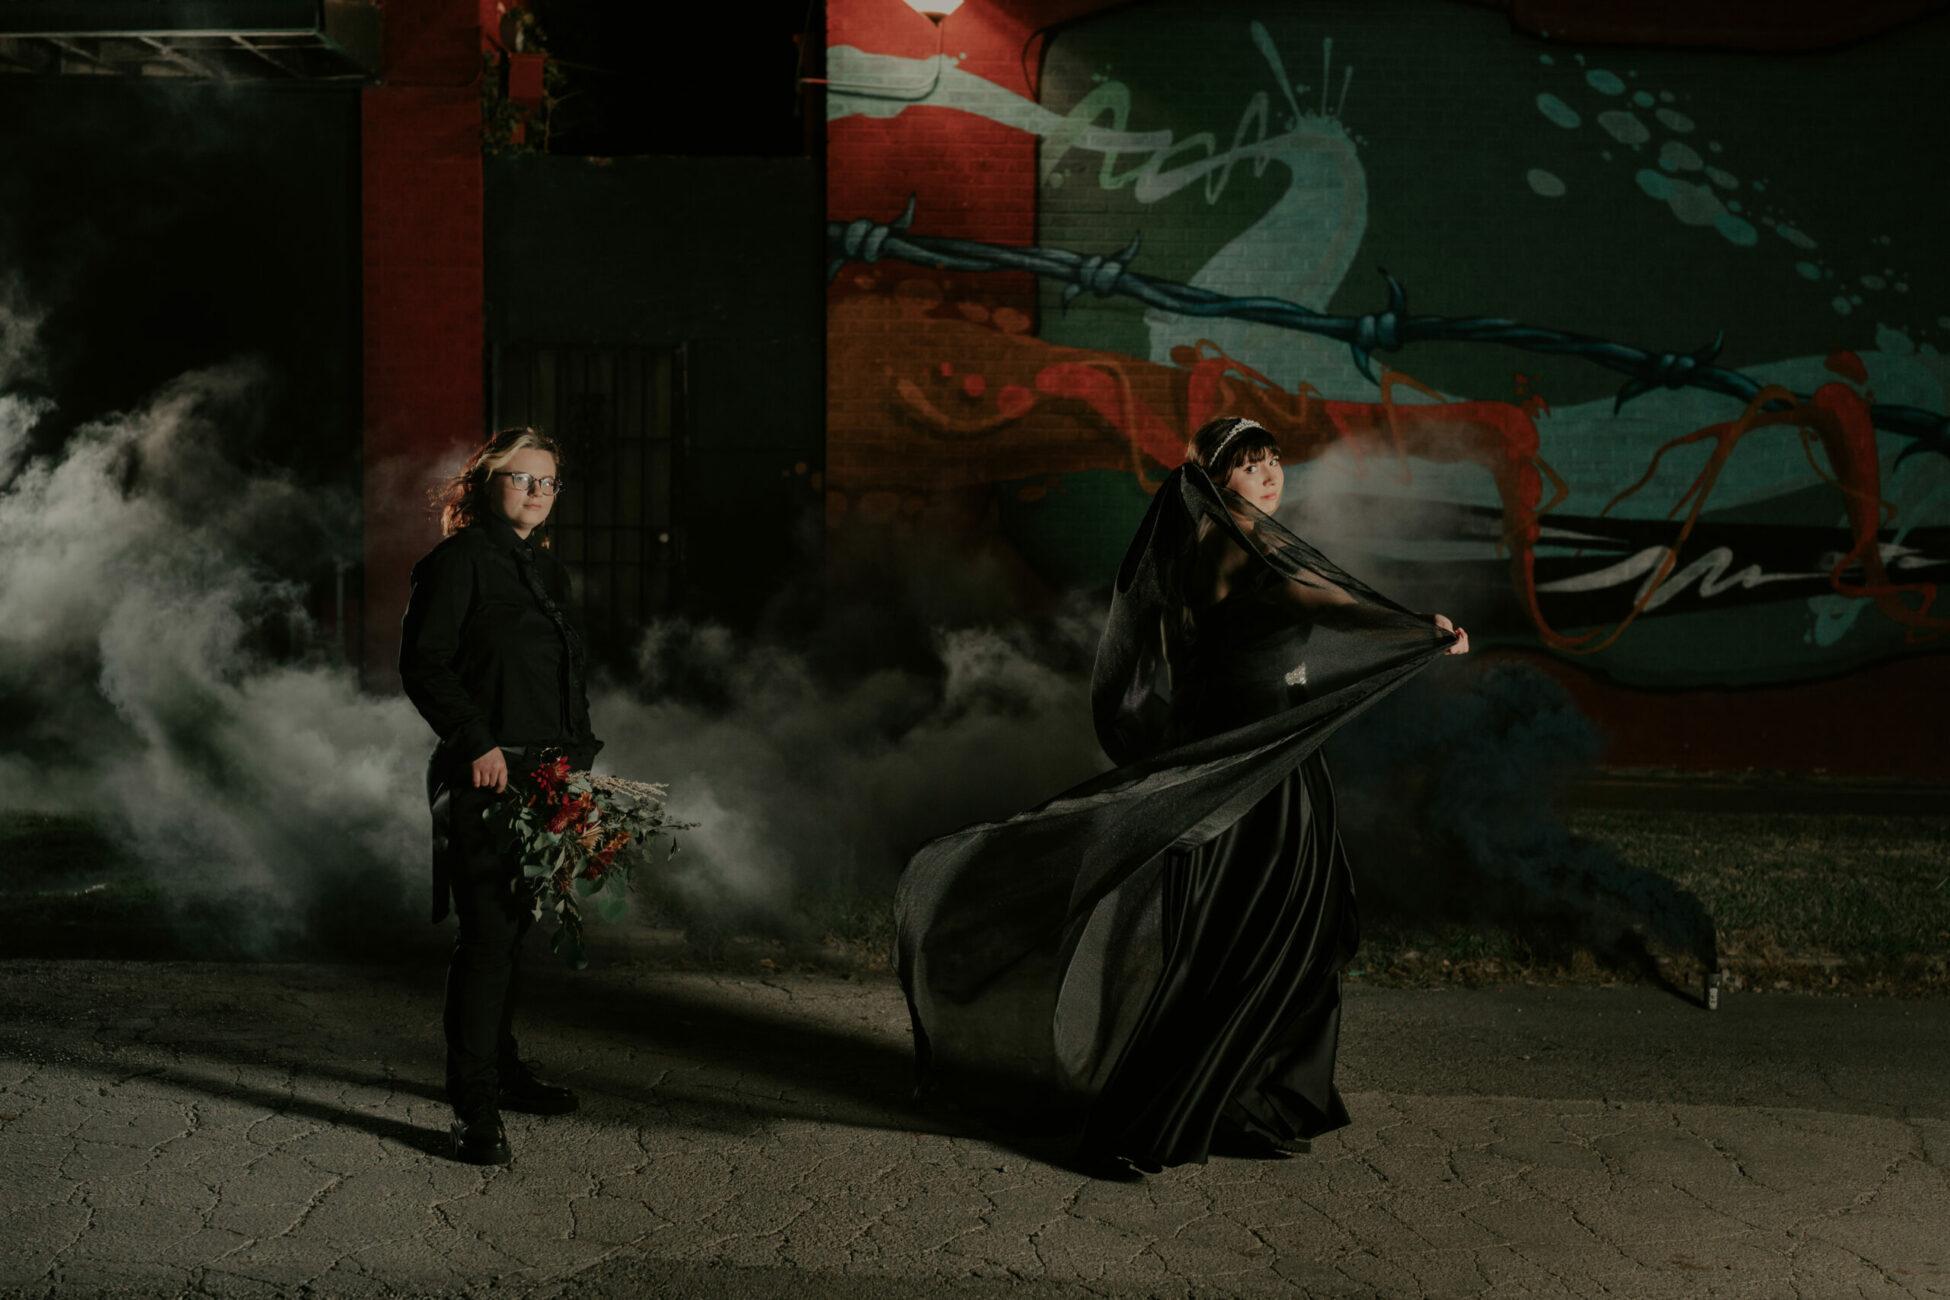 halloween-wedding-smoke-bomb-black-wedding-dress-viel-tulsa-wedding-photographer